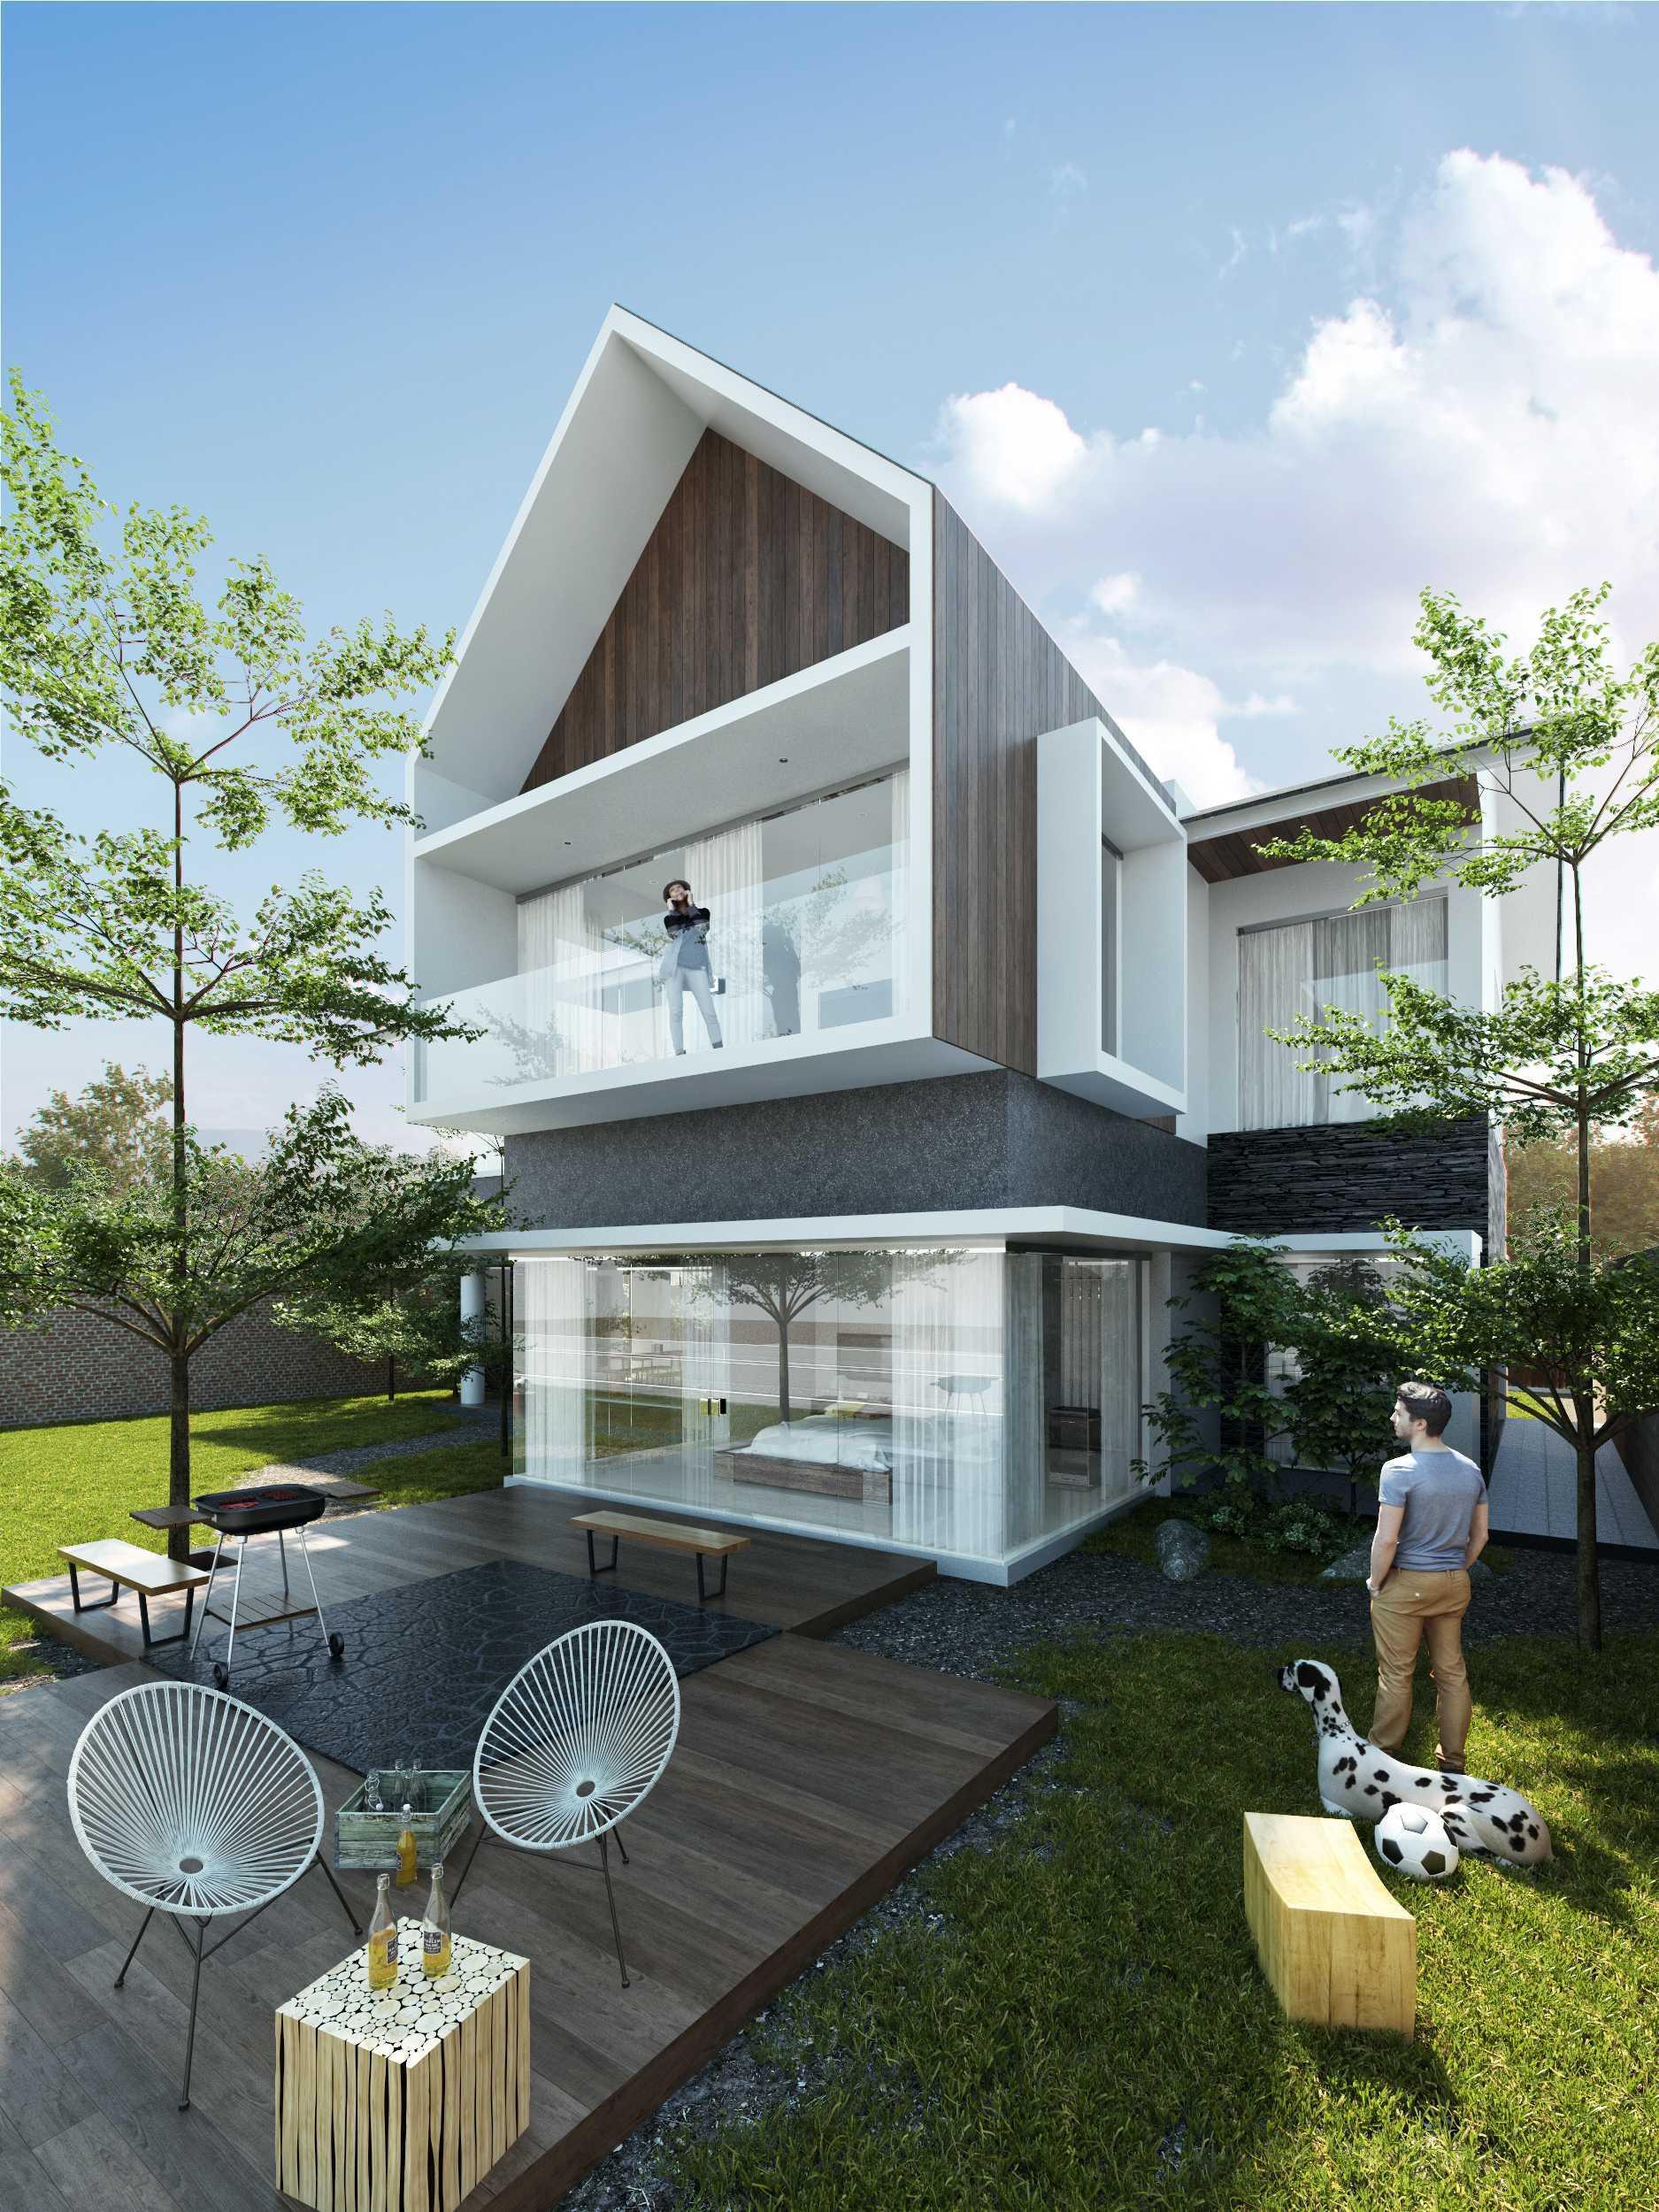 Sony Budiono & Partner Architect Firm Villa Kecil Pulau Putri Pulau Putri, Indonesia Pulau Putri, Indonesia Facade View   42784